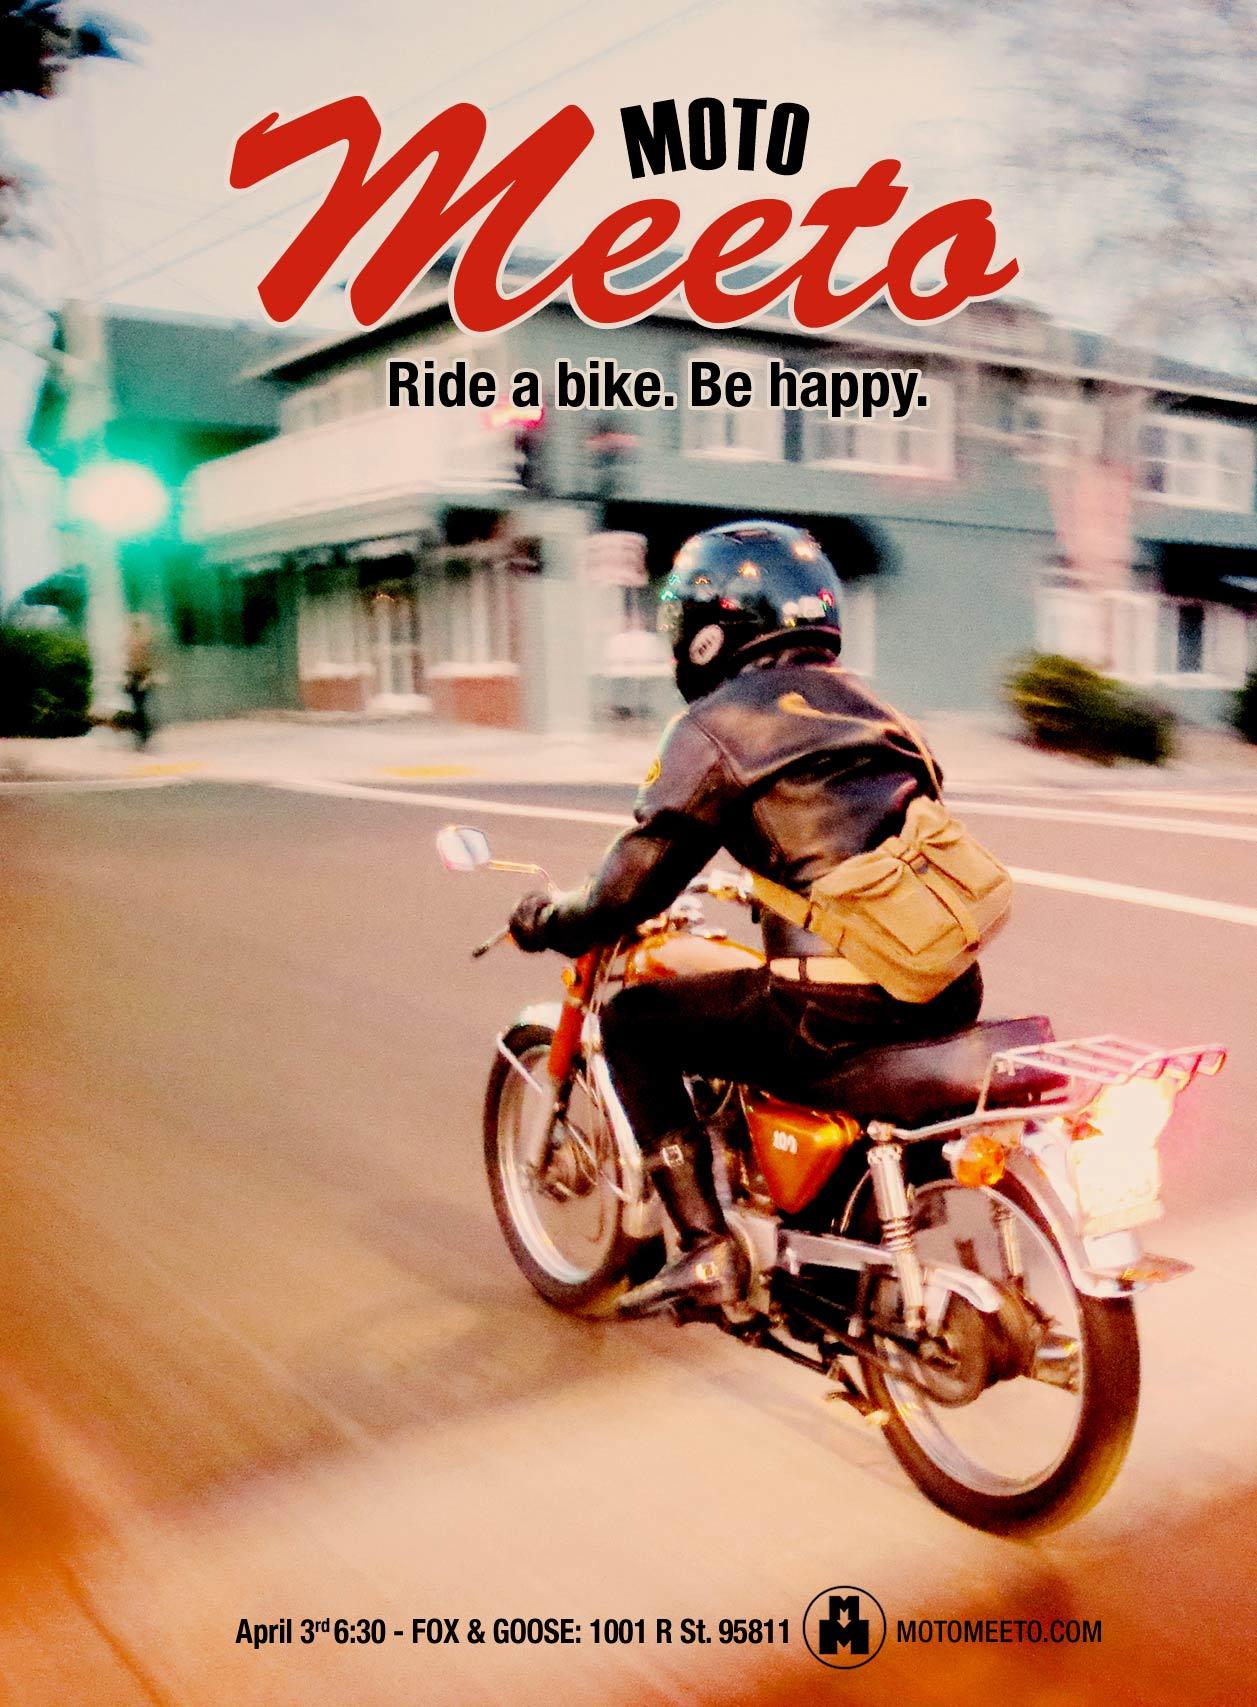 Meeto-March-2014.jpg